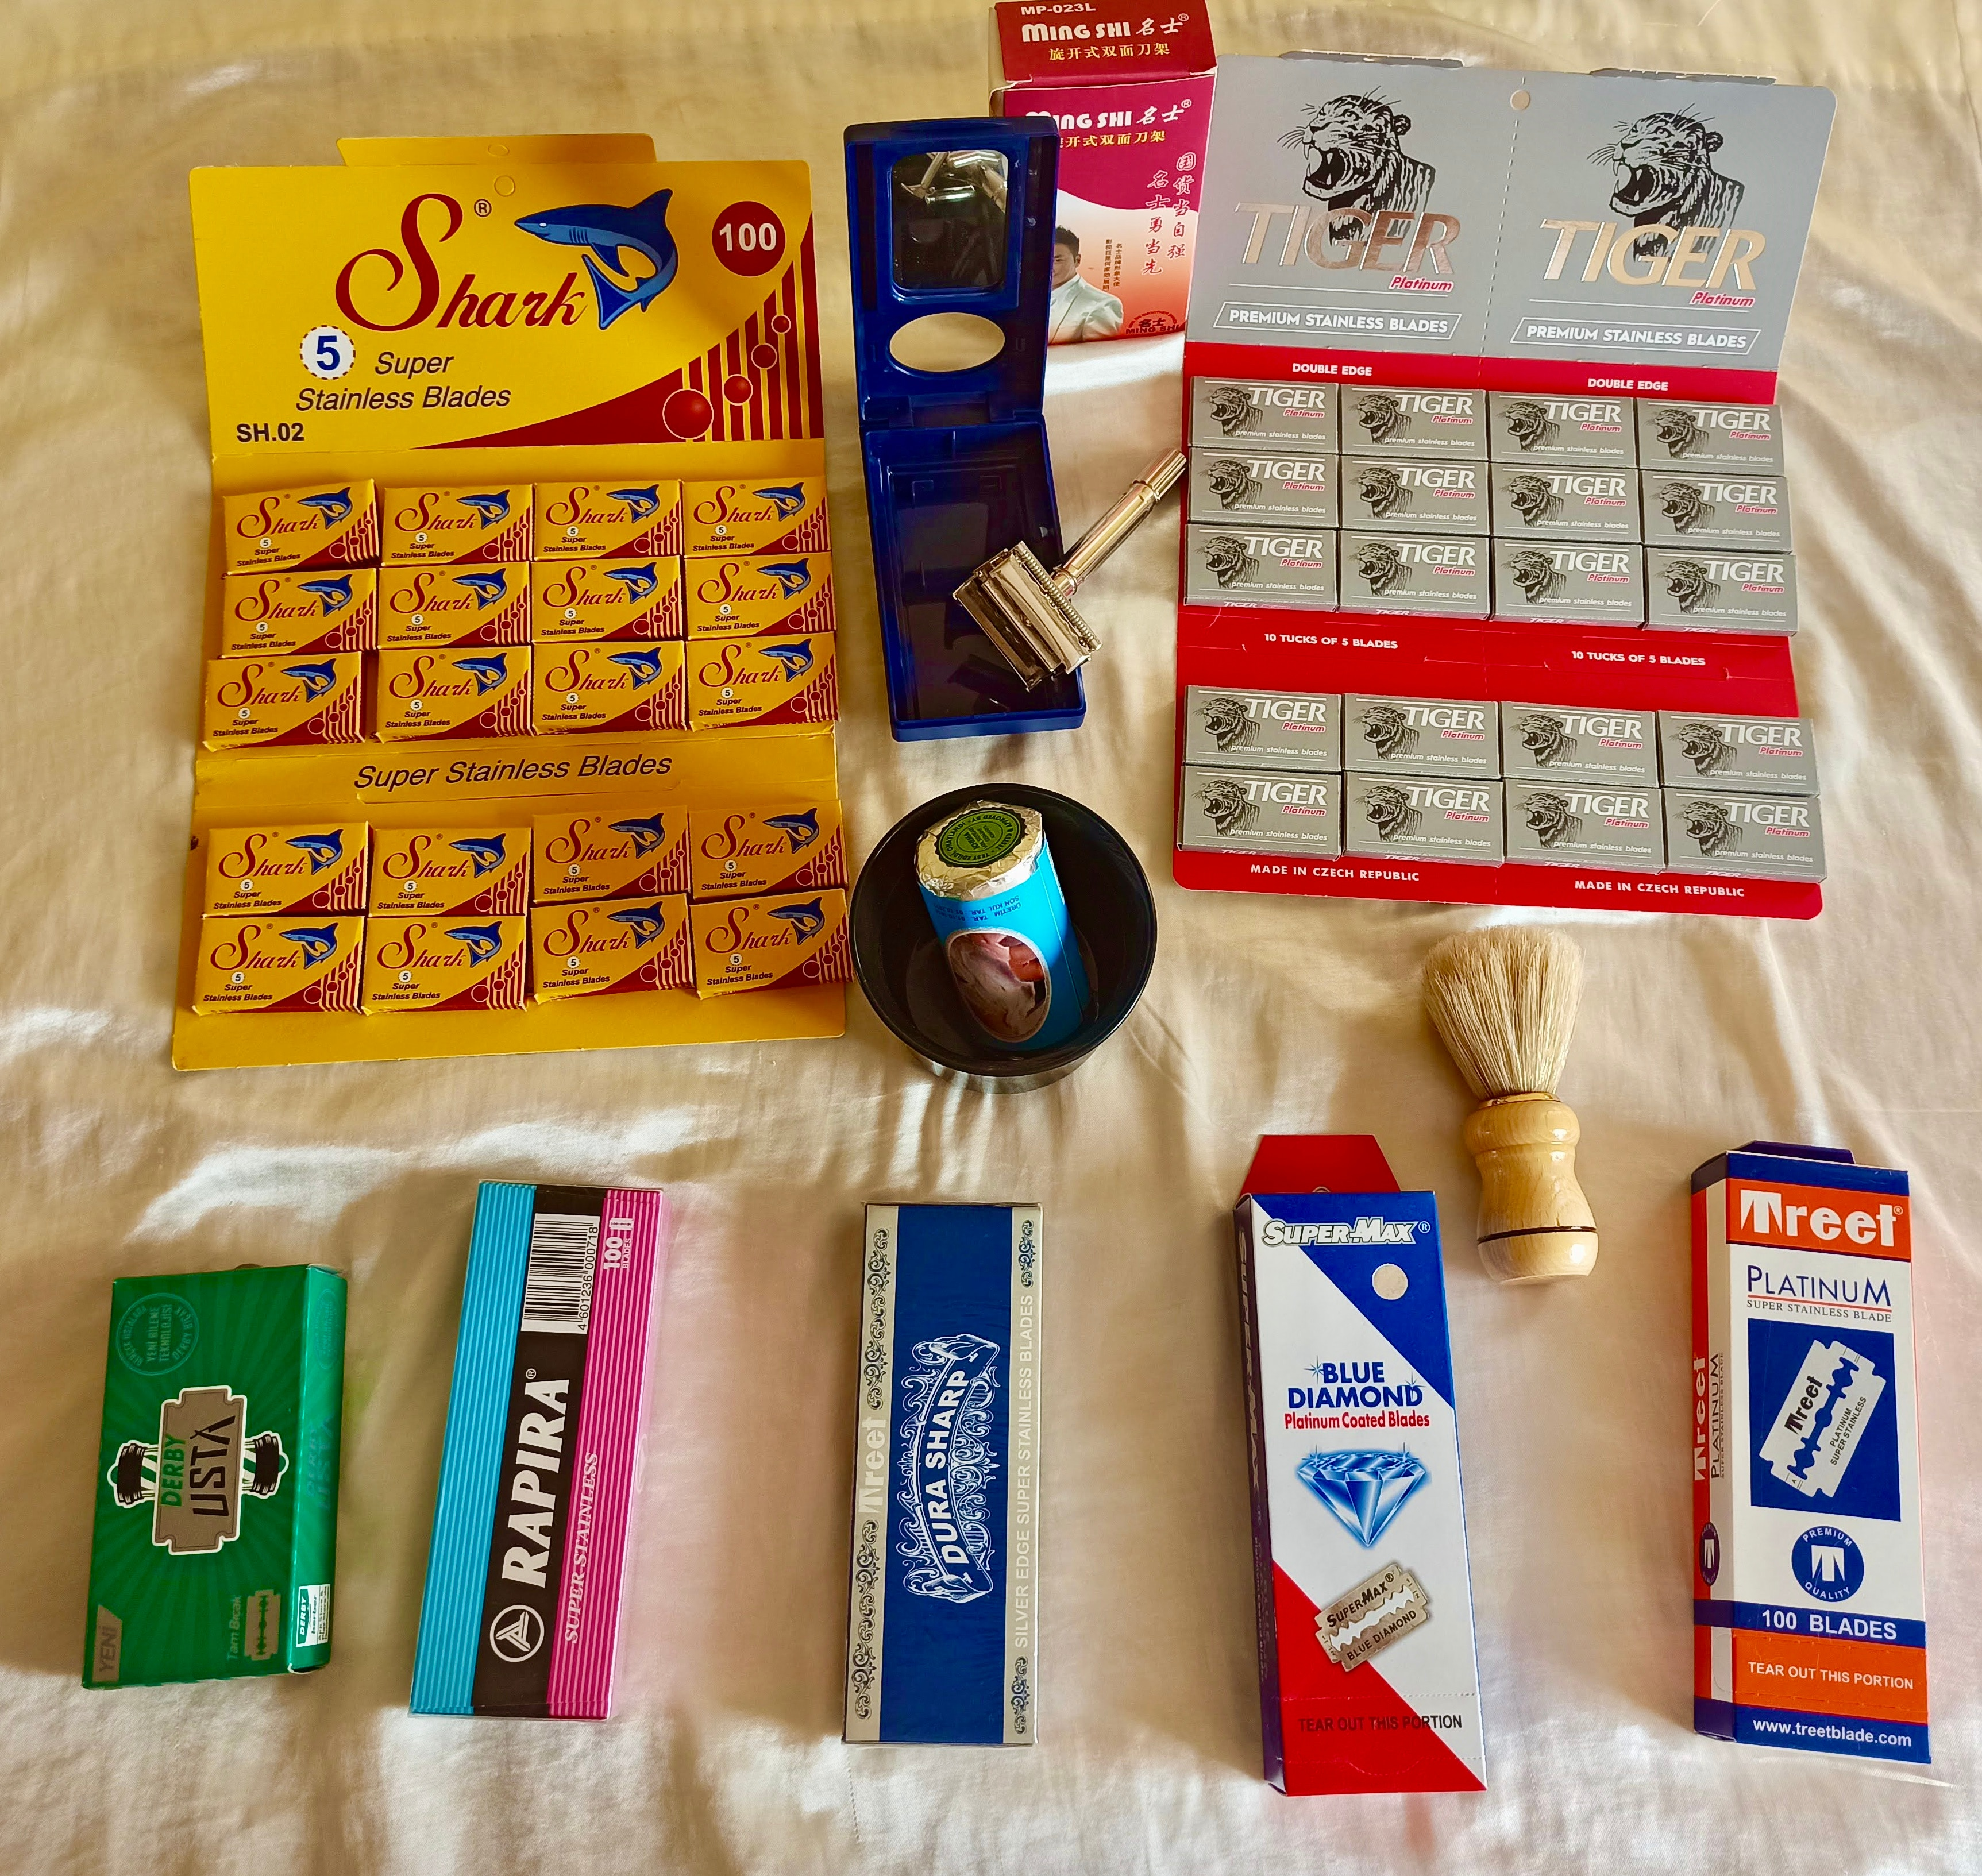 11 Piece,Gift Set for Men Shaving Box,700 Shaving Razors, Soap,Brush,Shaving Bowl & Safety Razor